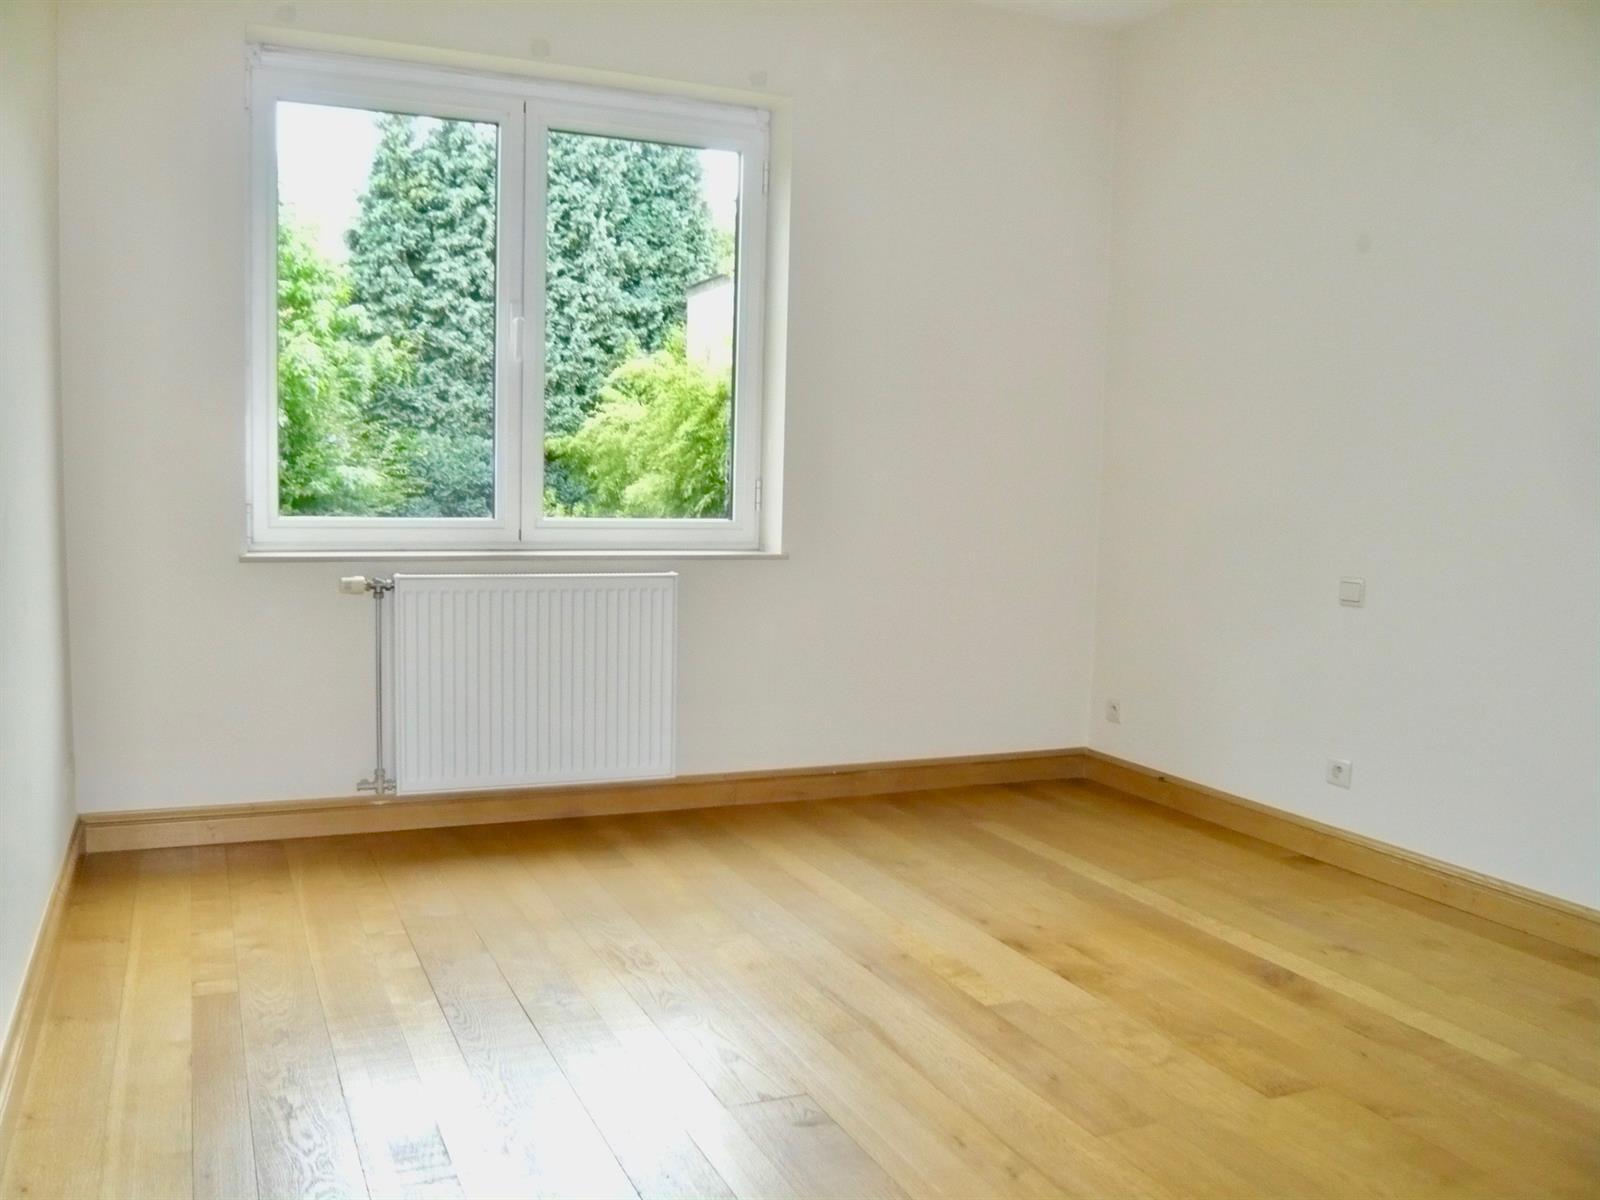 Appartement exceptionnel - Woluwe-Saint-Pierre - #4433517-30